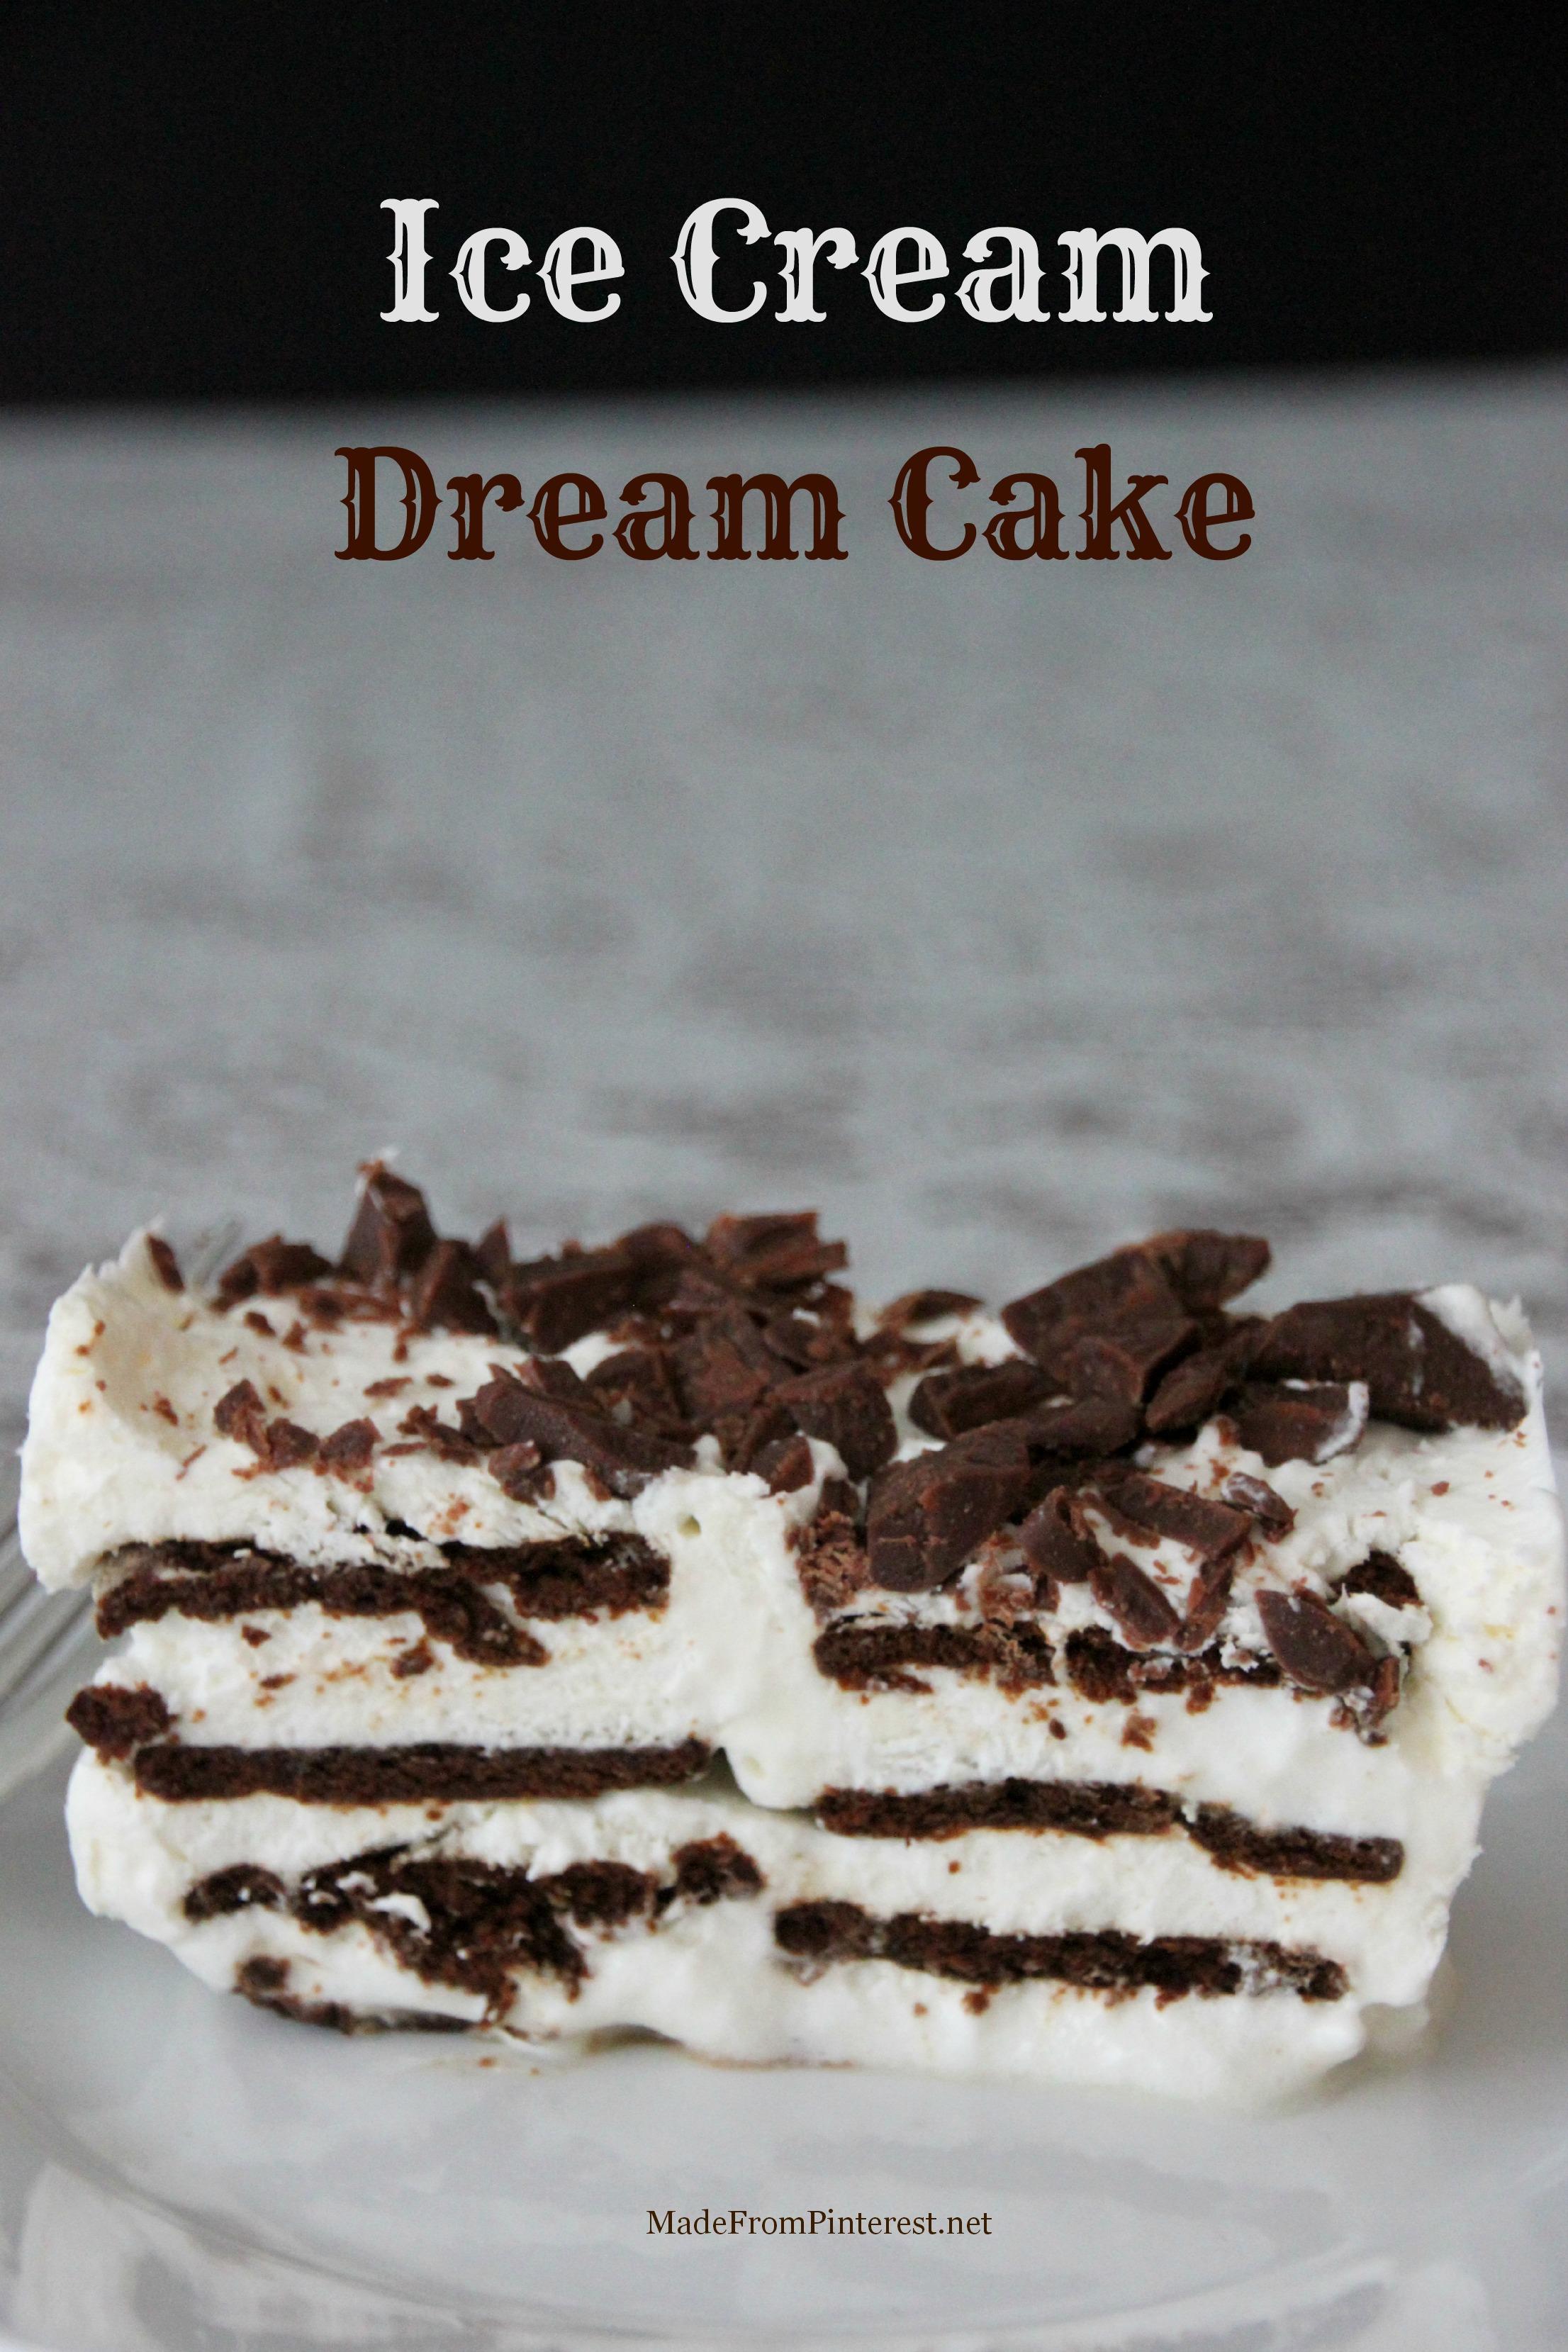 Personal Cake That Looks Like Ice Cream